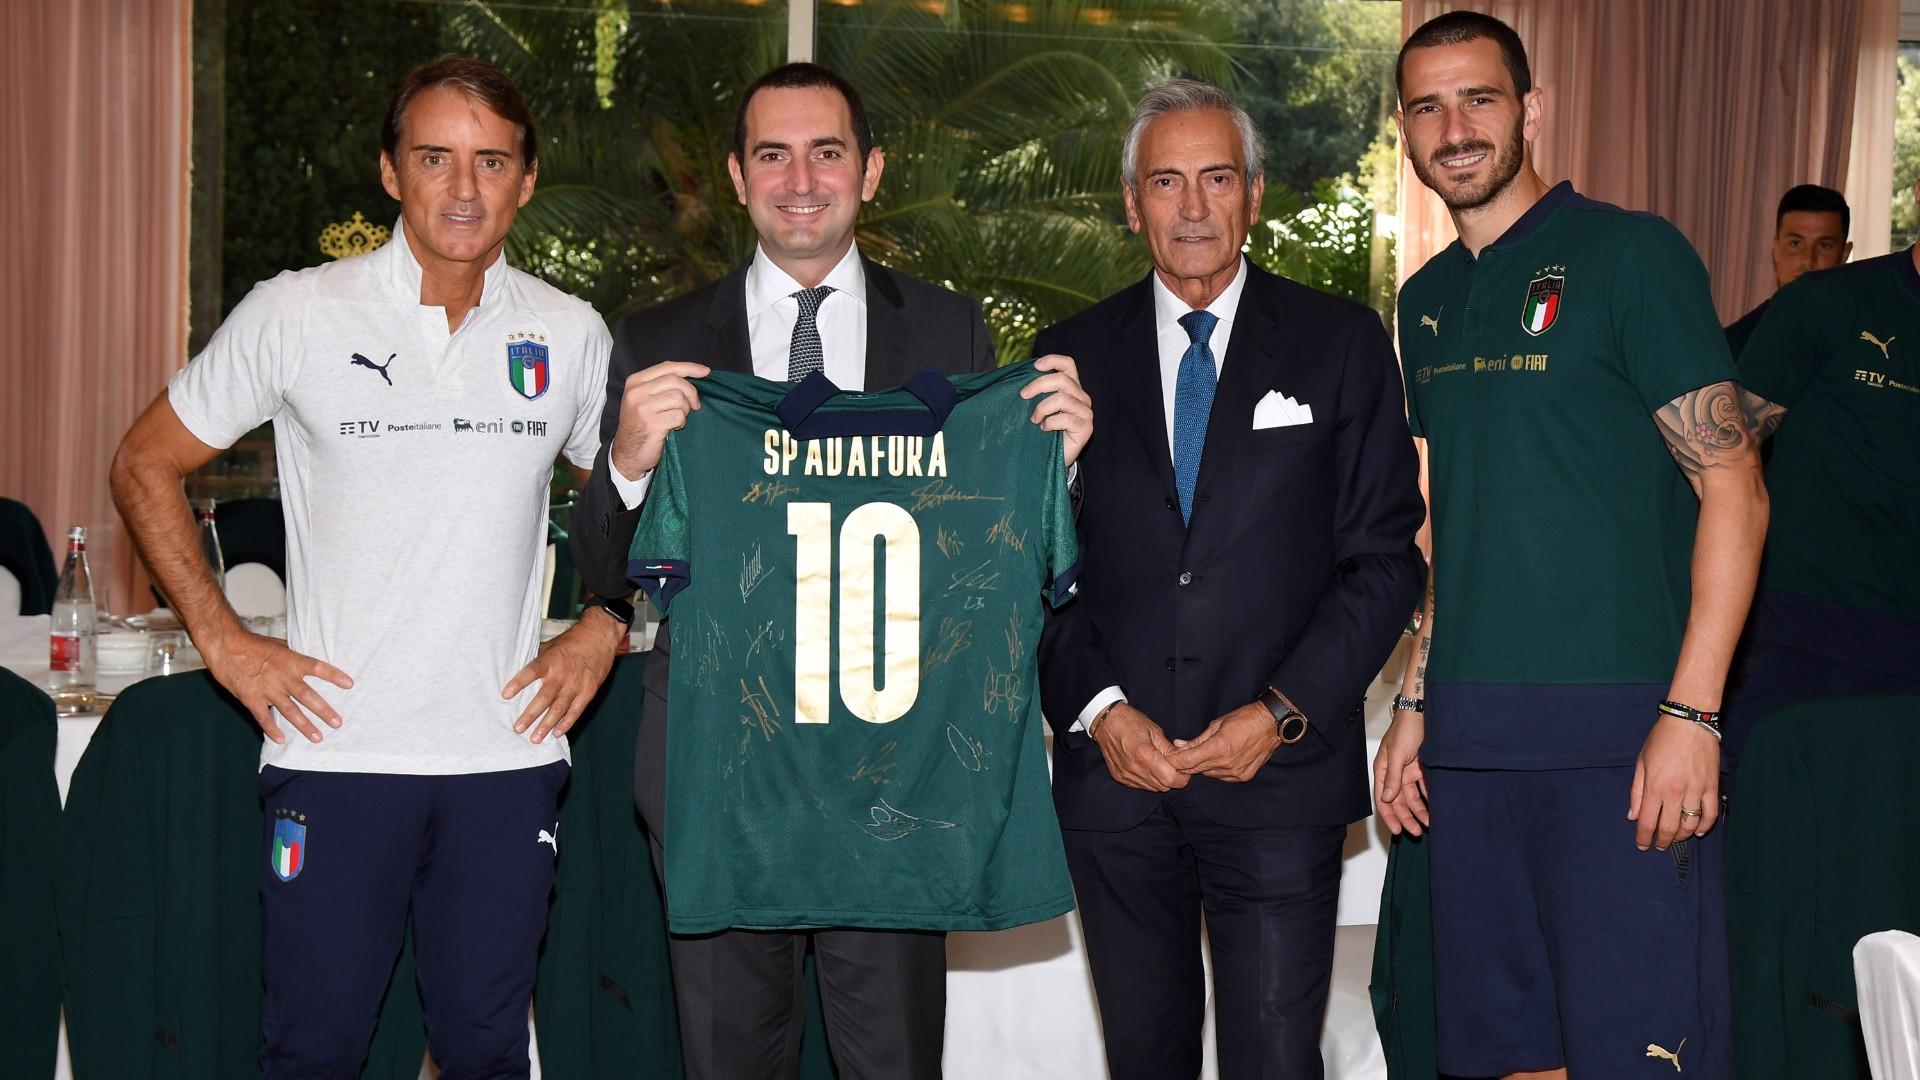 Coronavirus - Le ministre des Sports italien espère que la Serie A reprendra en mai